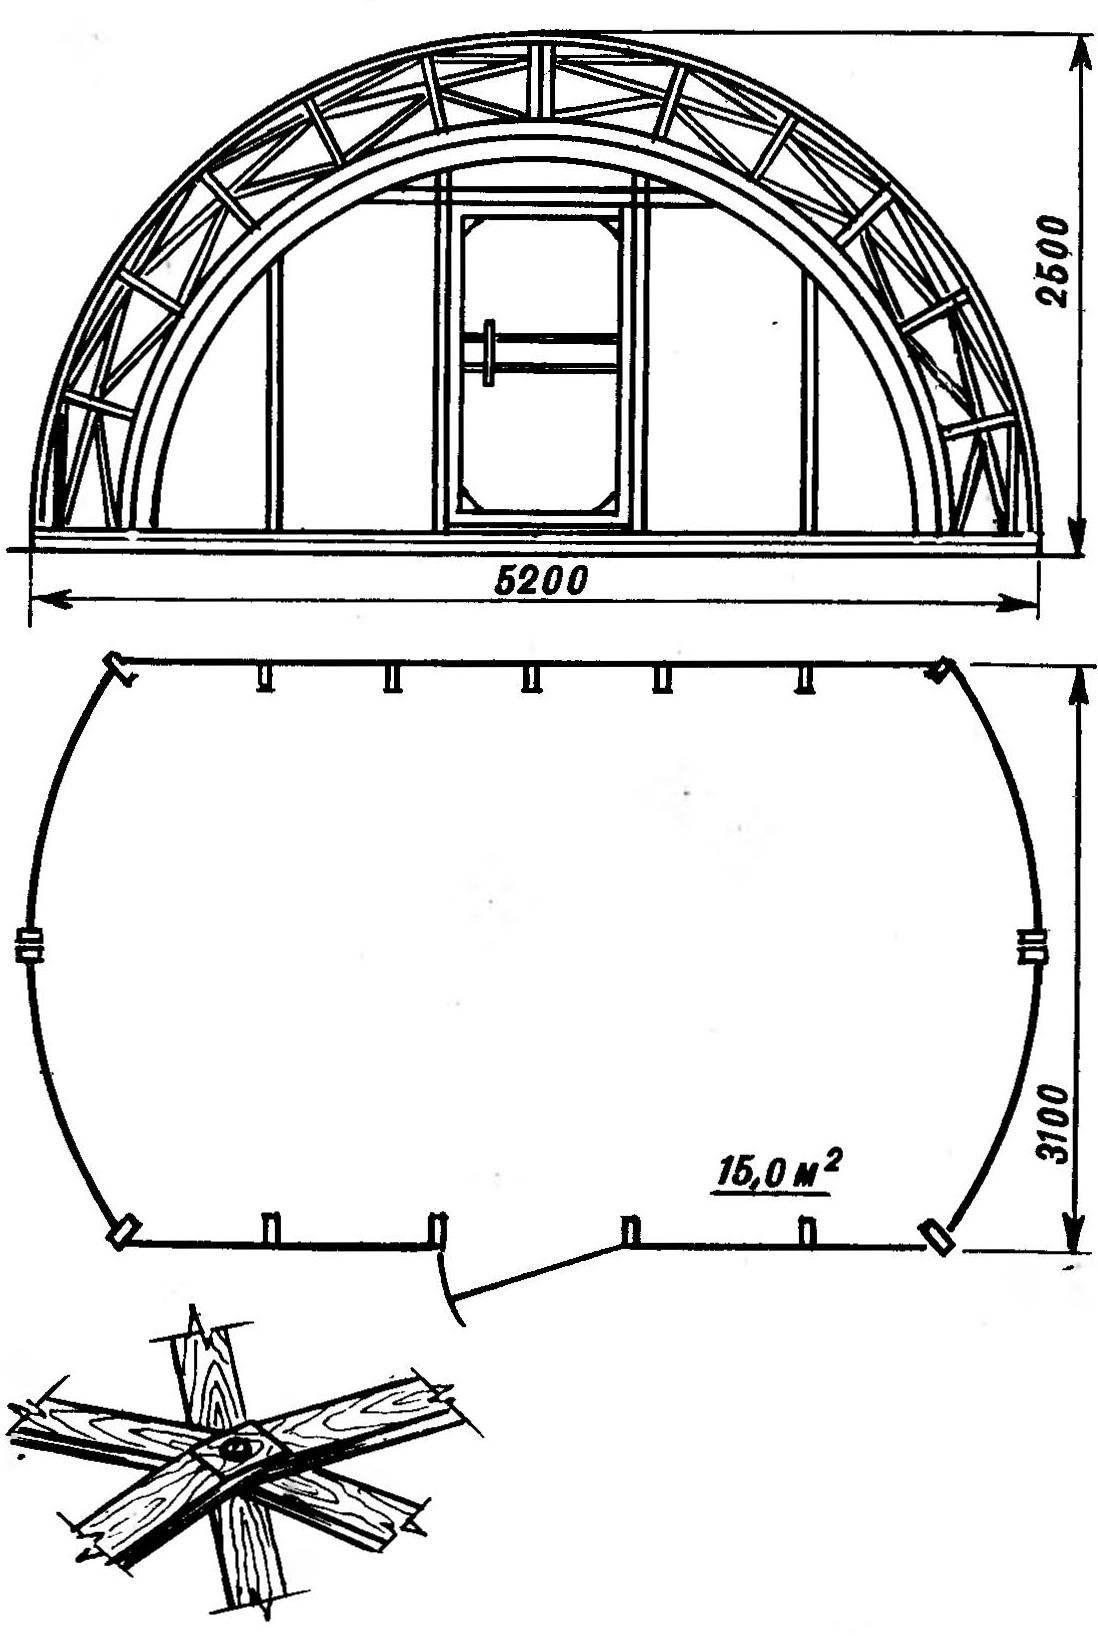 Фасад и план арочного каркаса. Внизу - типовое соеденение стержней каркаса